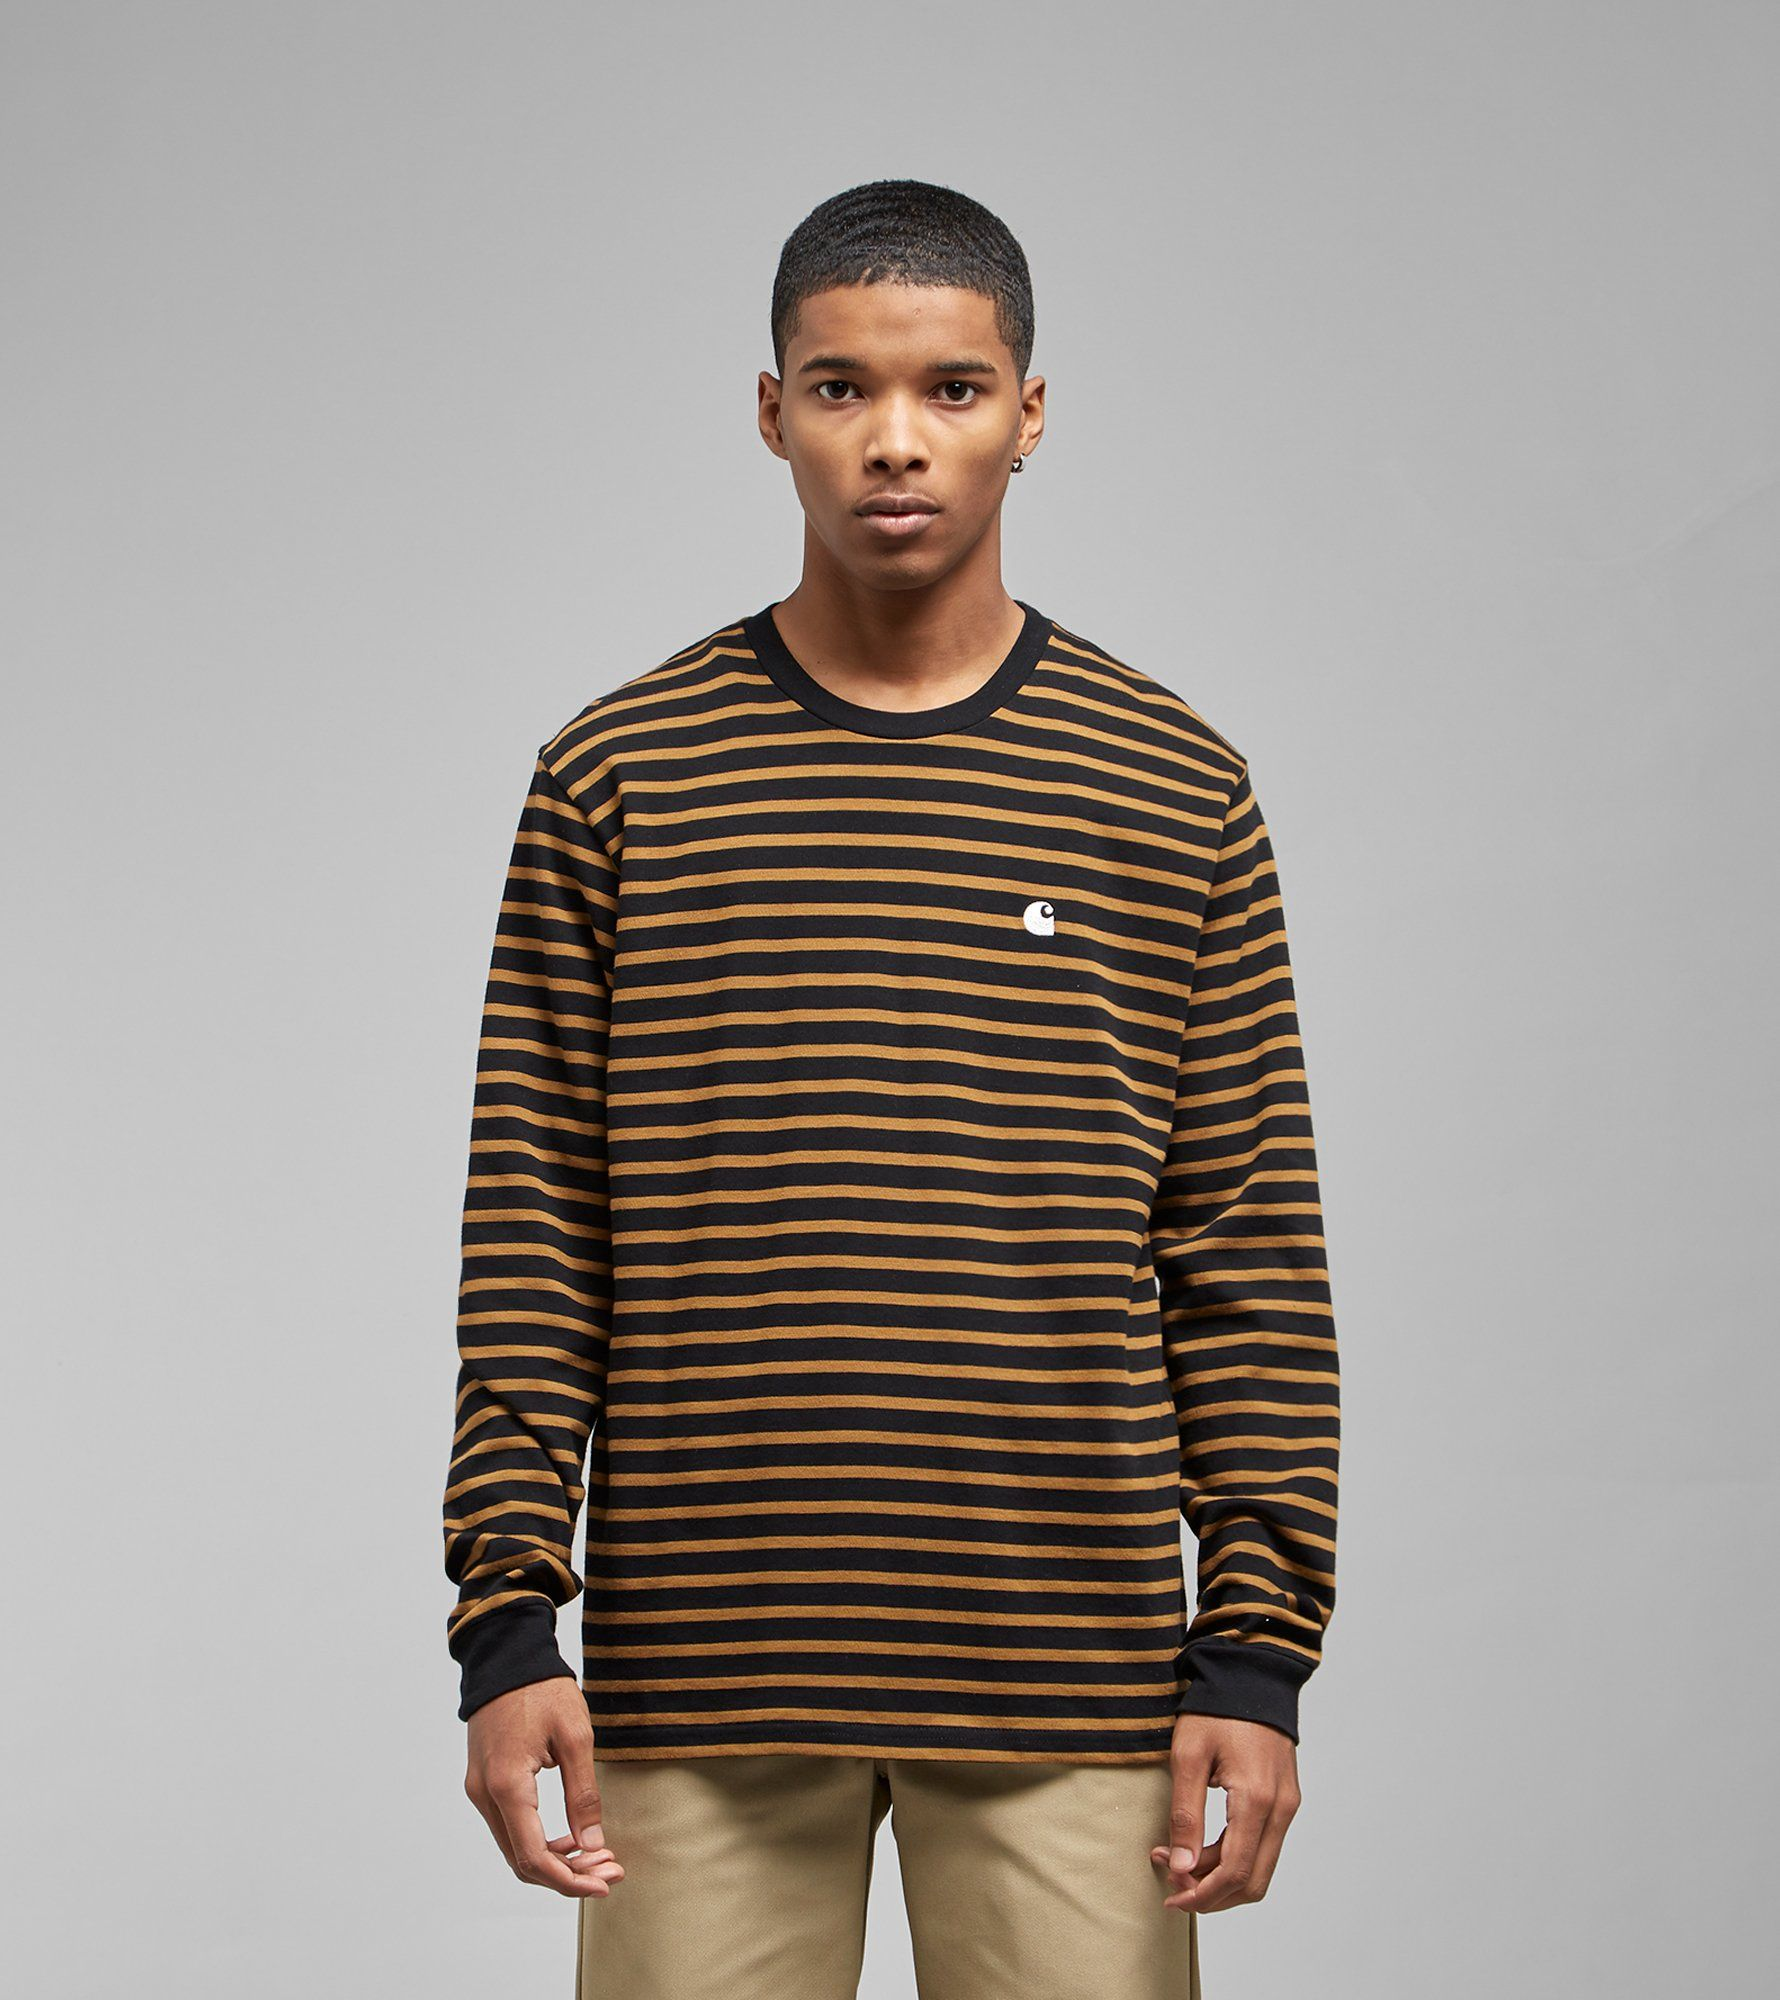 Carhartt WIP Robie Long Sleeved T-Shirt